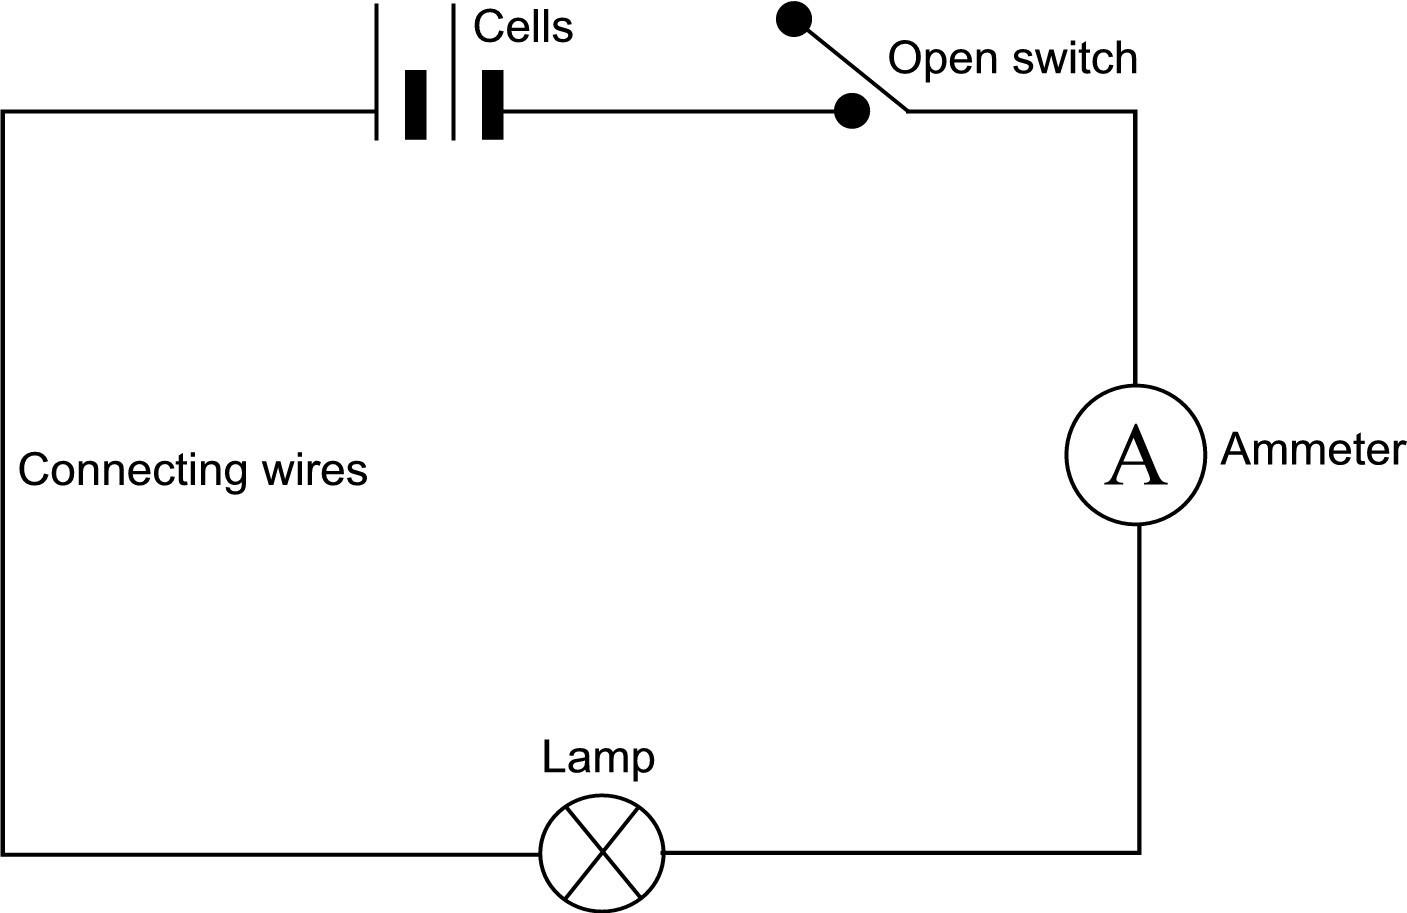 Basic Wiring Diagram Luxury Simple Circuit Diagram